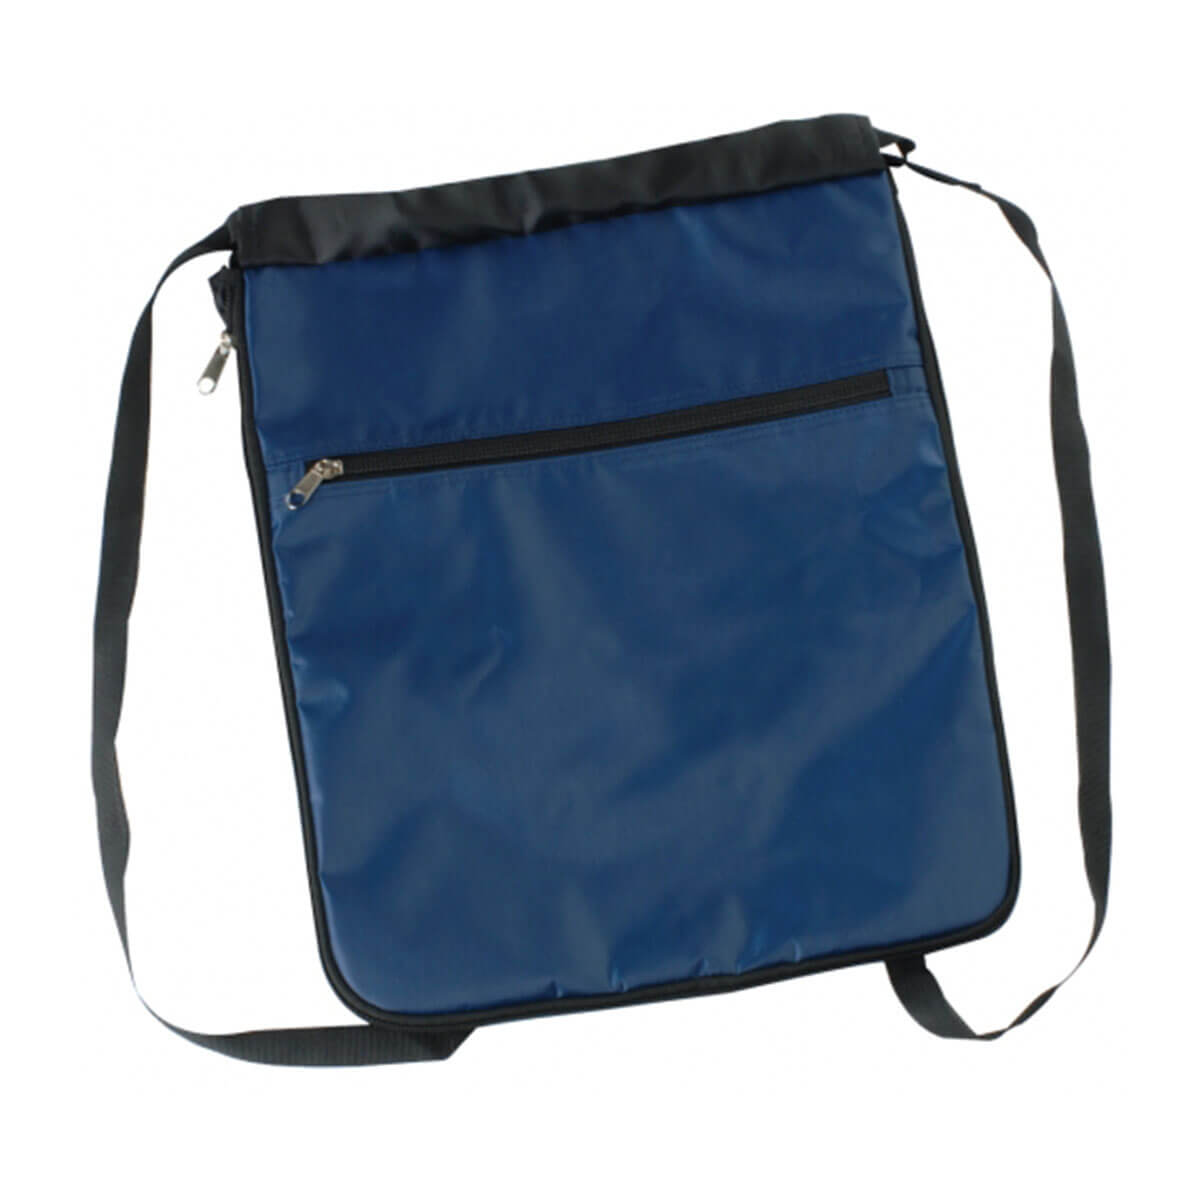 Backsack – Zip Pocket-Navy / Black